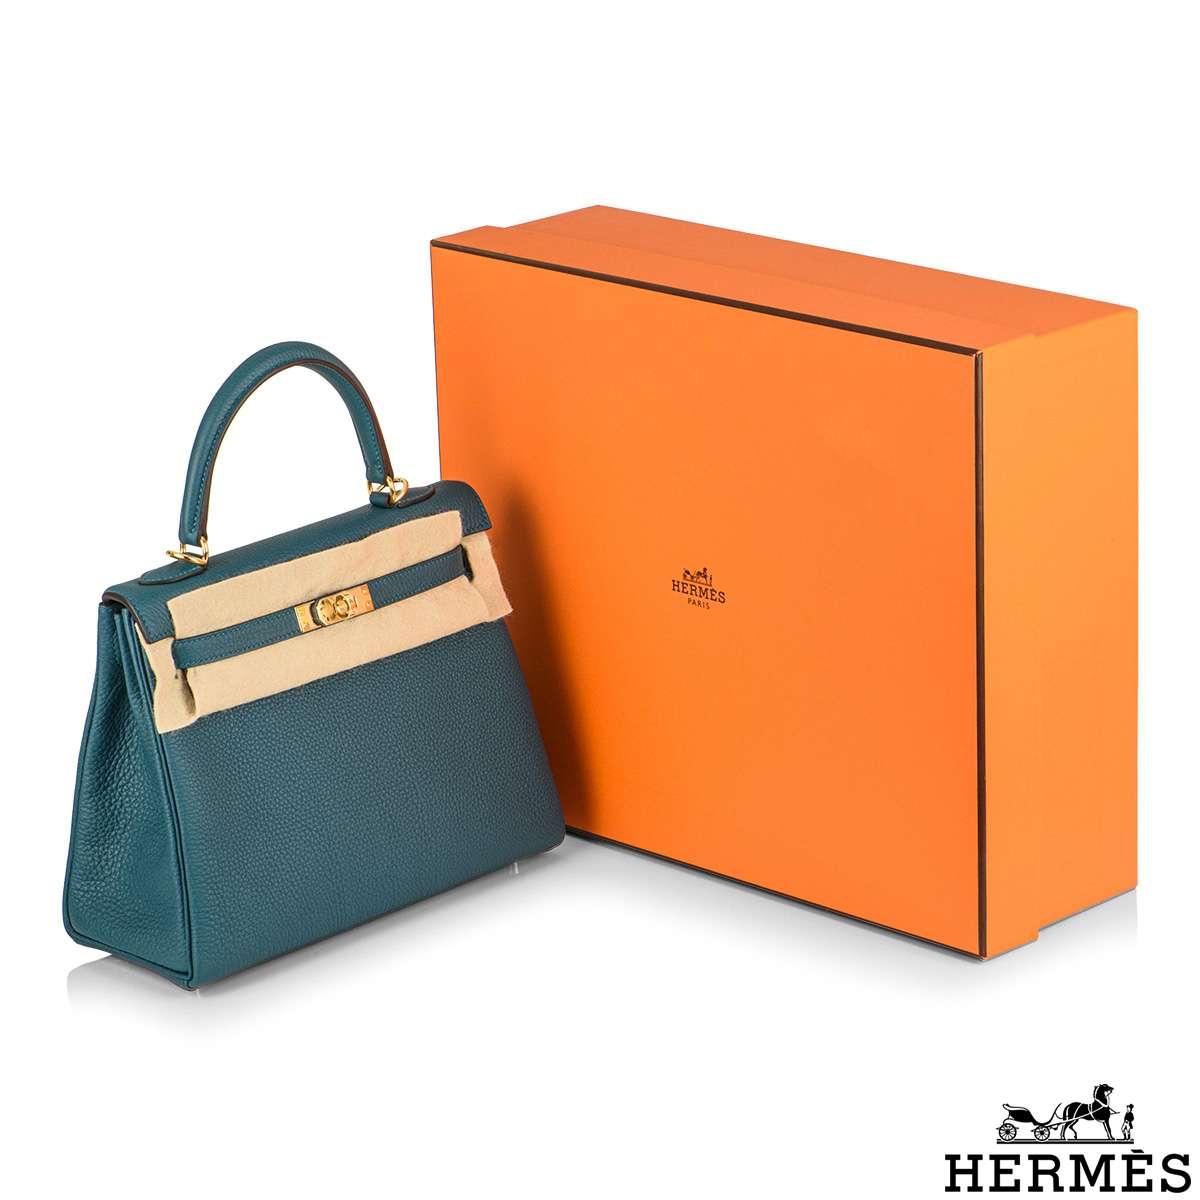 Hermès Kelly II Retourne 28cm Vert Bosphore Togo Handbag